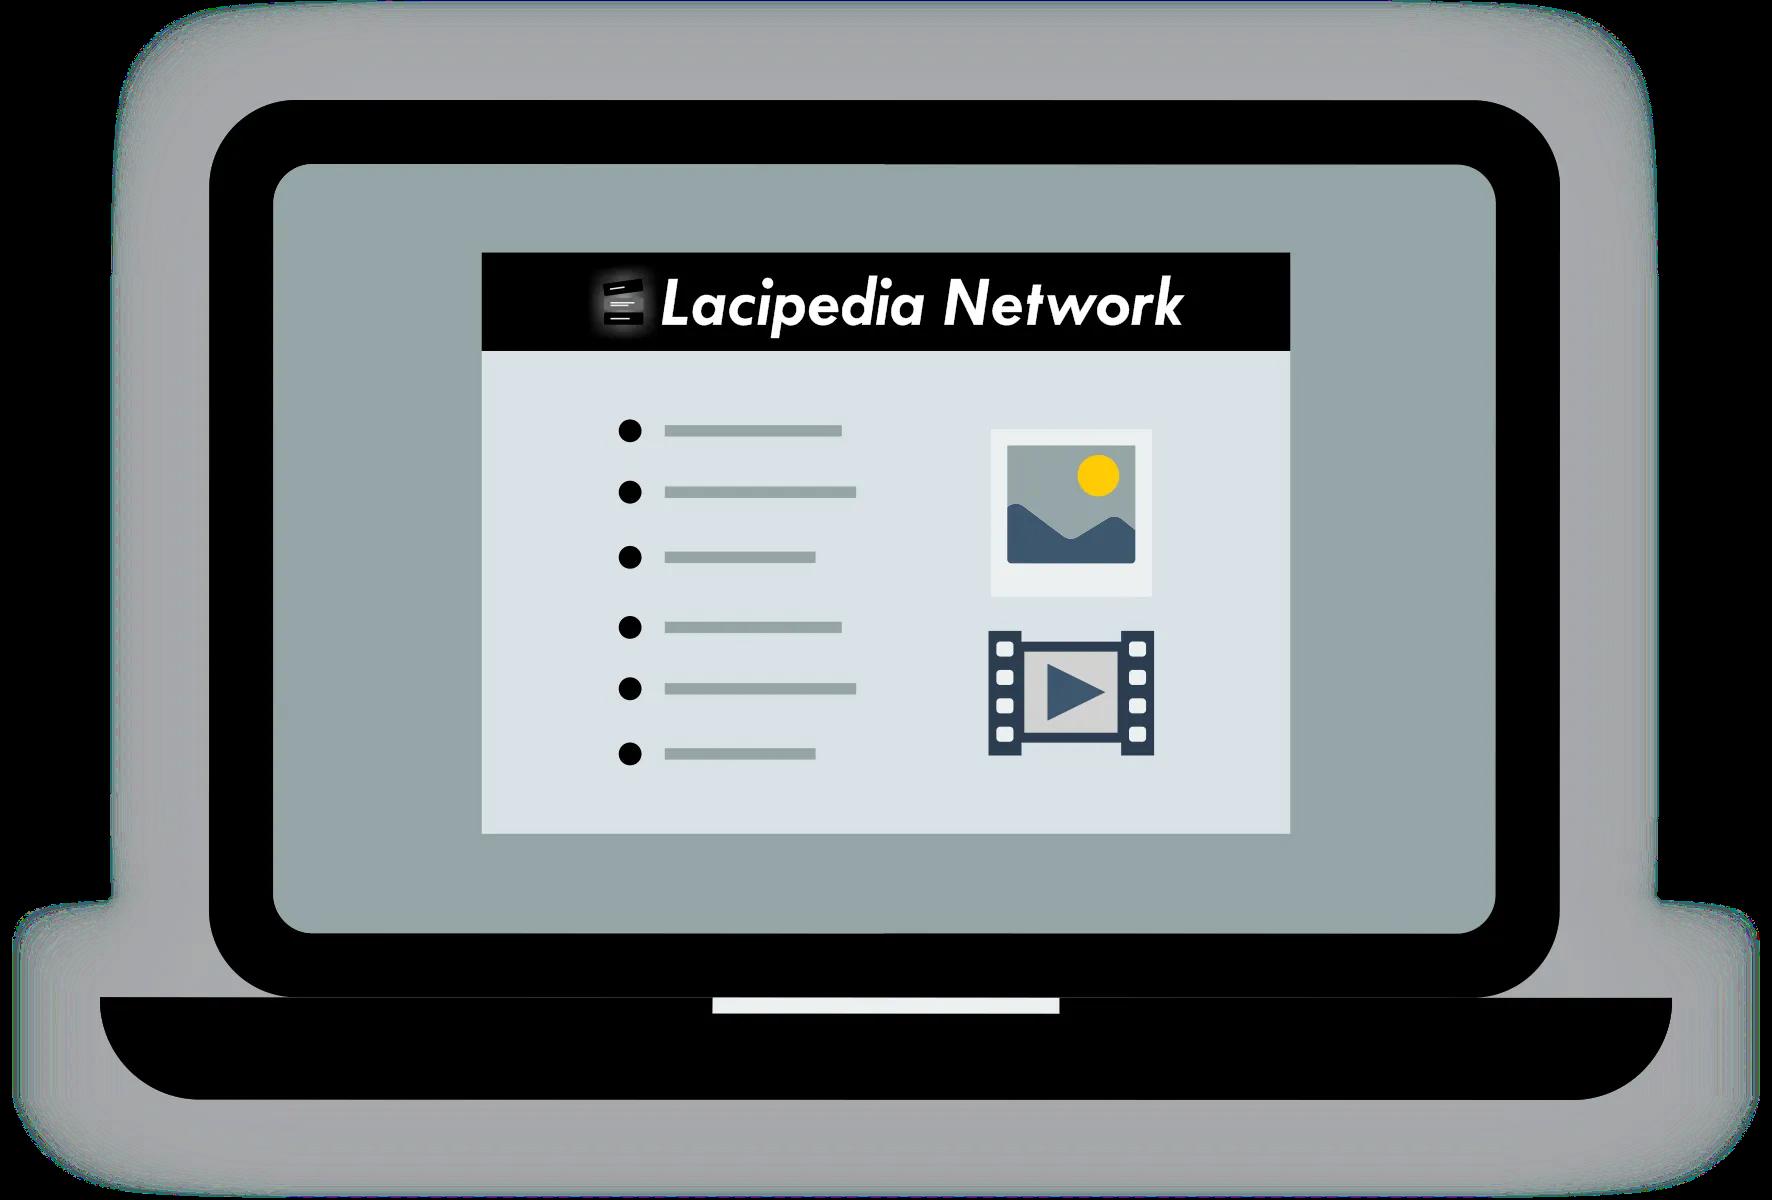 Blogspot Landing Page - Lacipedia Network